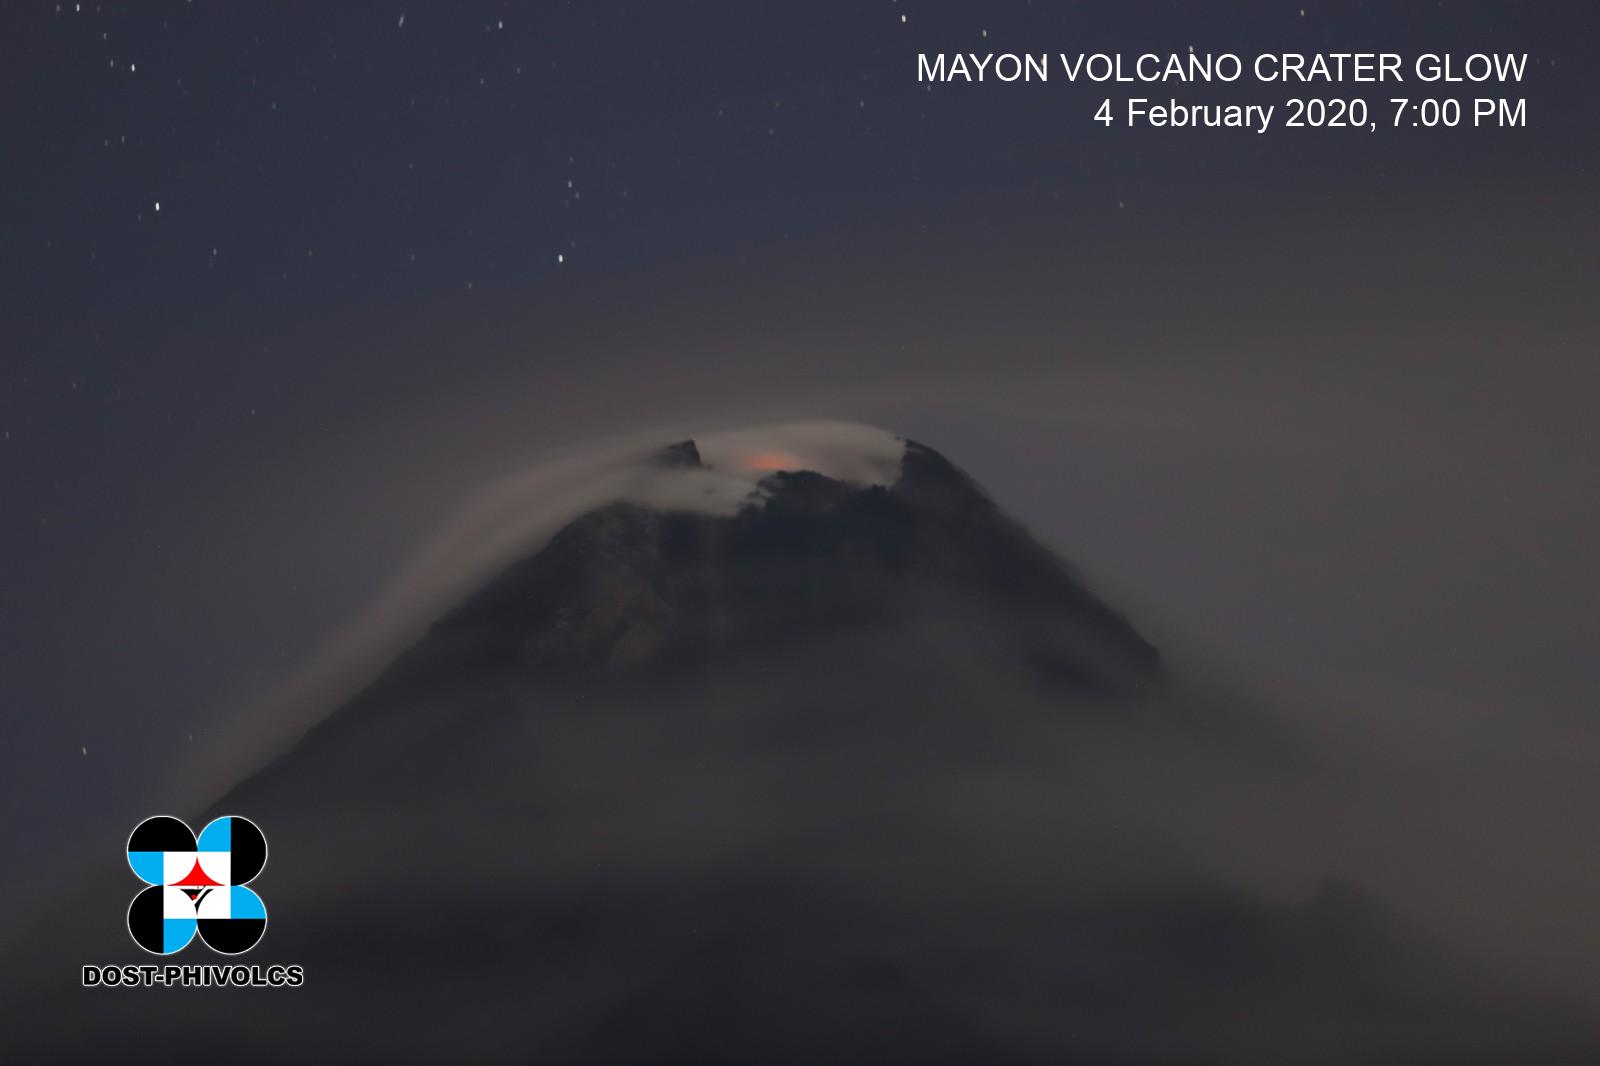 February 06, 2020. EN . Philippines : Mayon / Taal , Italy : Stromboli , Indonesia : Anak Krakatau , Costa Rica : Turrialba / Poas / Rincon de la Vieja .